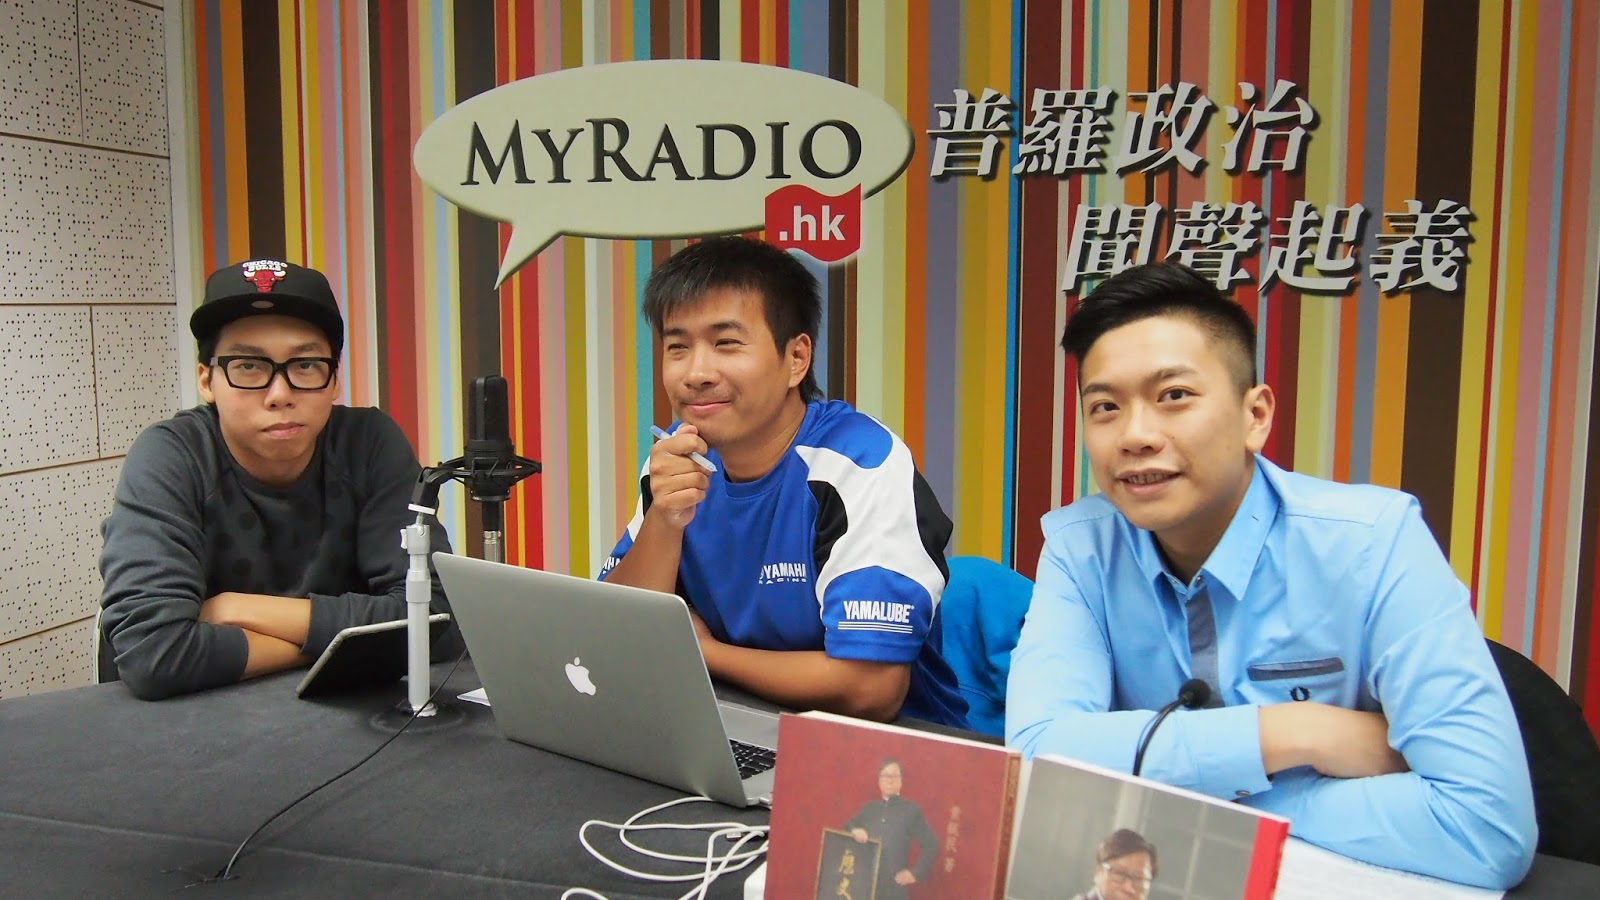 MyRadio.HK 臺務網誌: 香港製造 141127 ep68